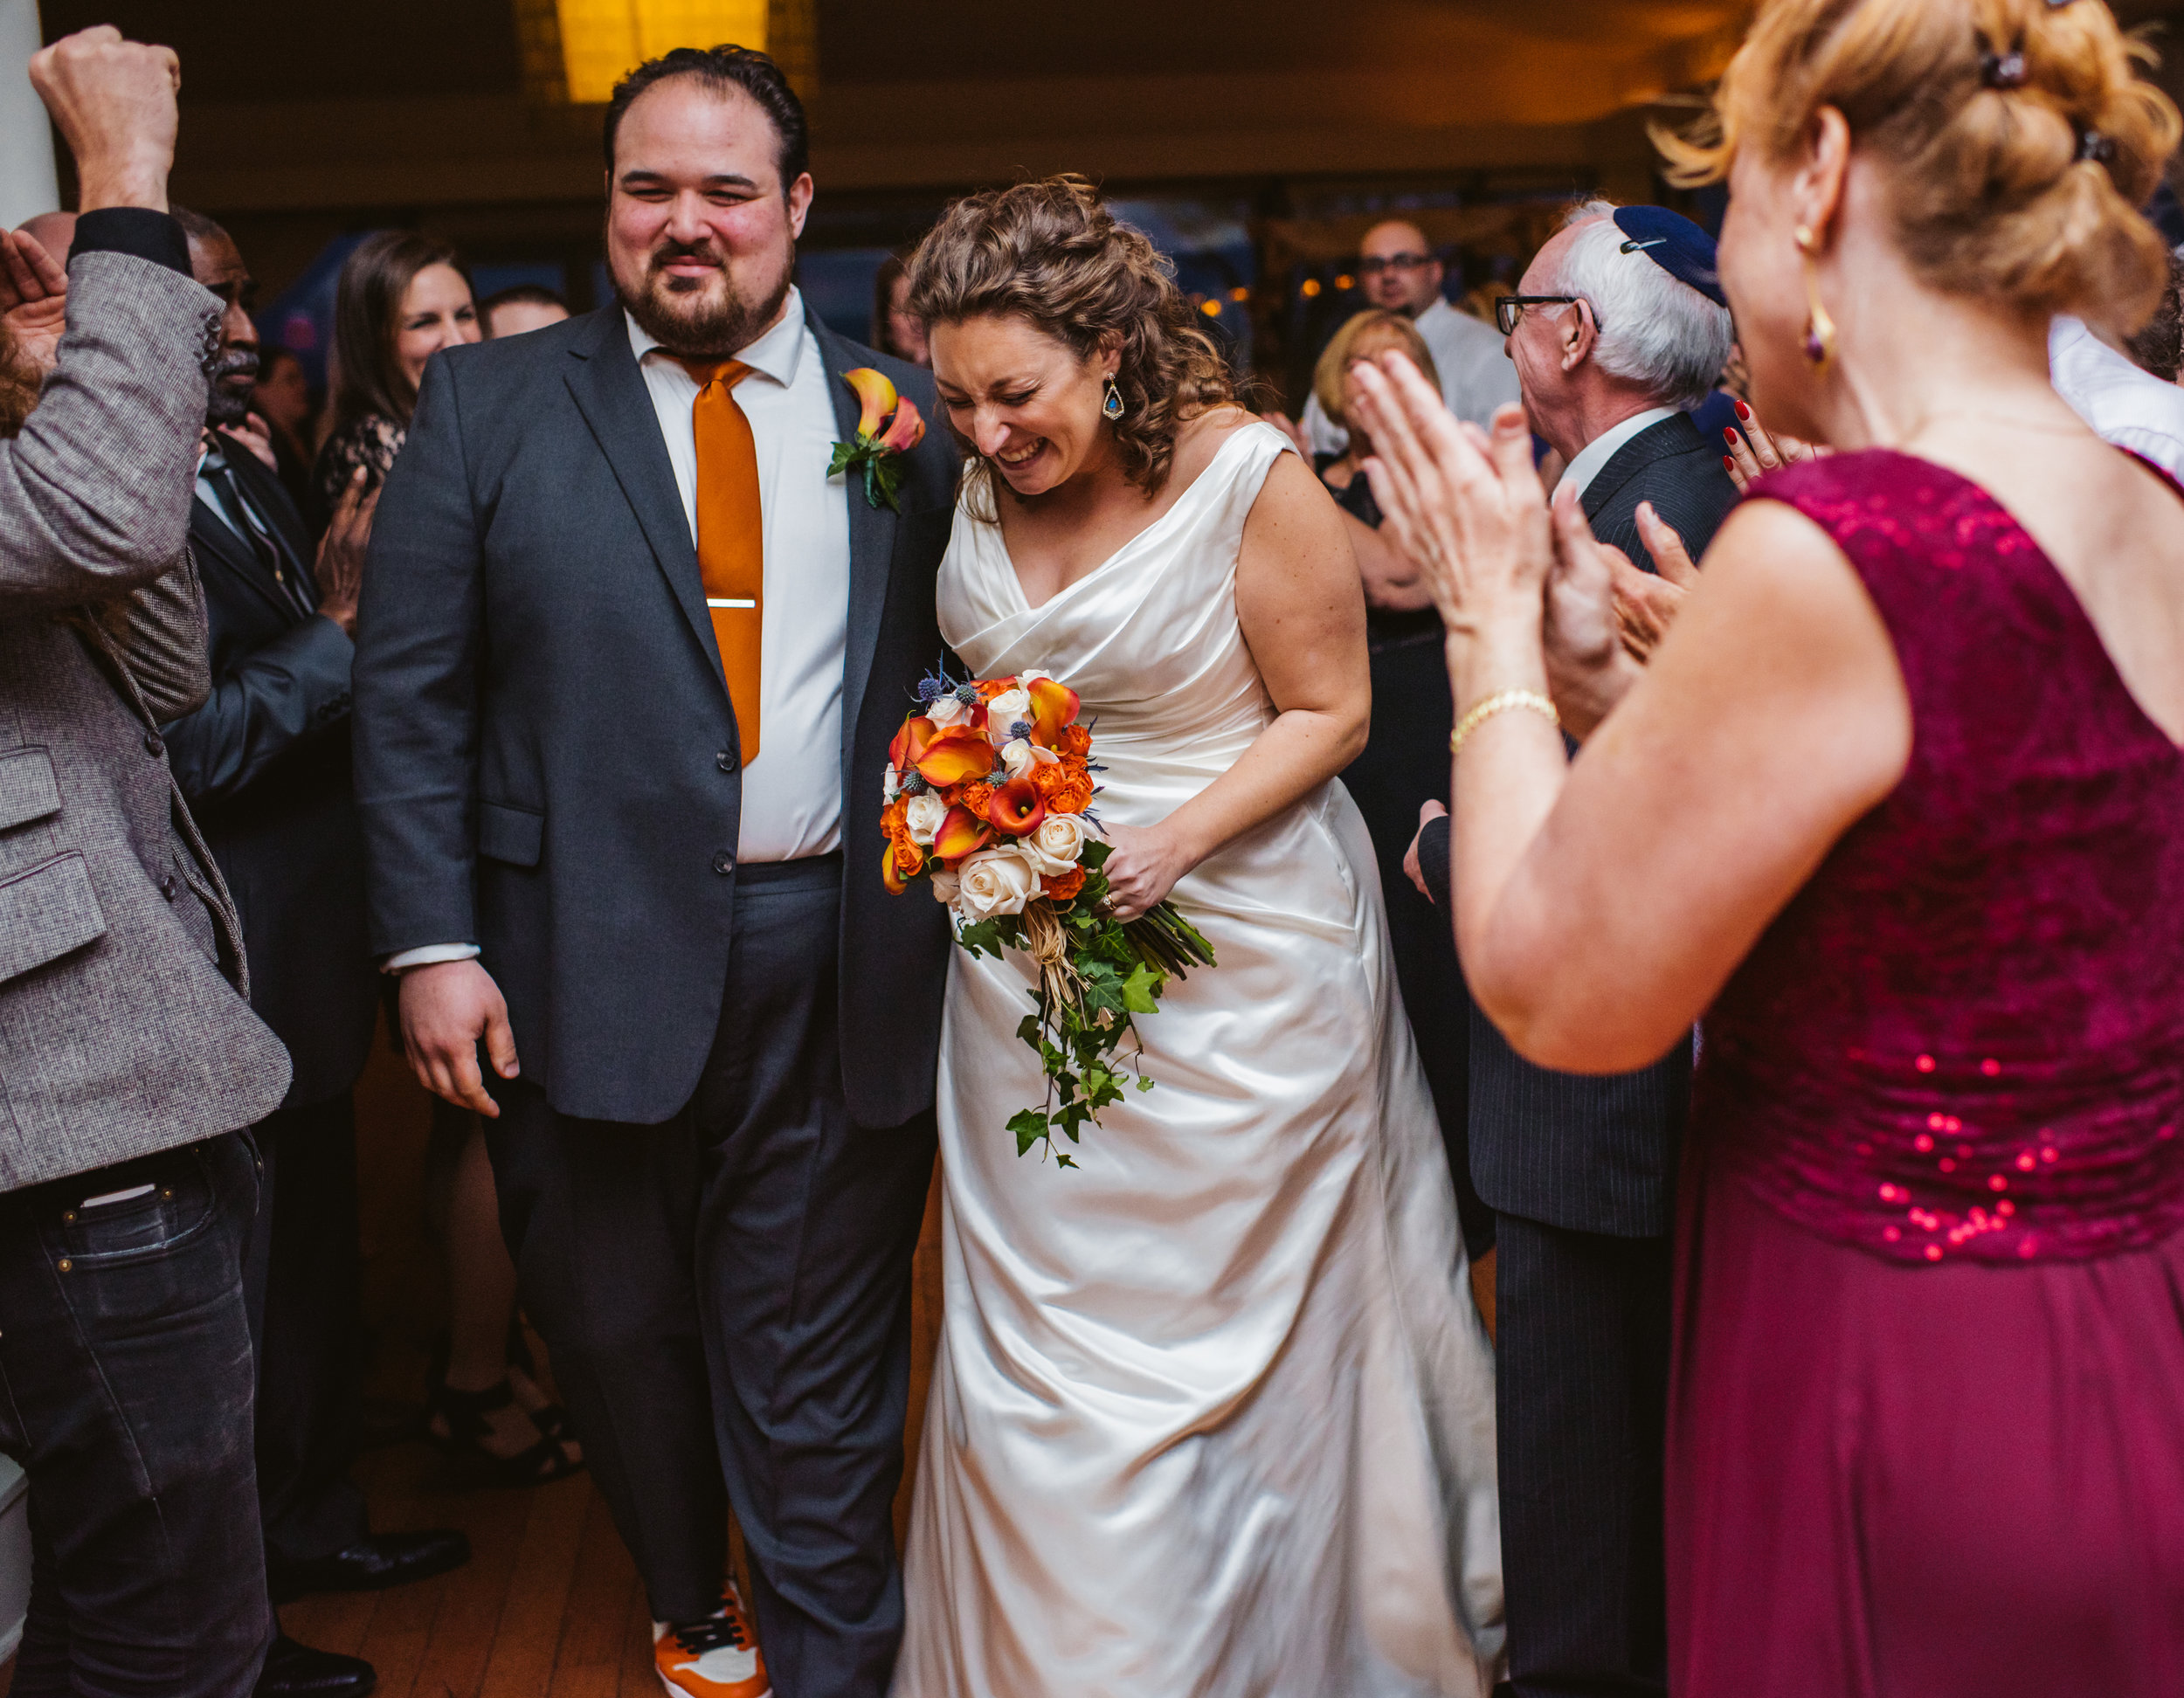 LIZA & JON - BATTERY PARK WEDDING - NYC INTIMATE WEDDING PHOTOGRAPHER - CHI-CHI AGBIM-668.jpg